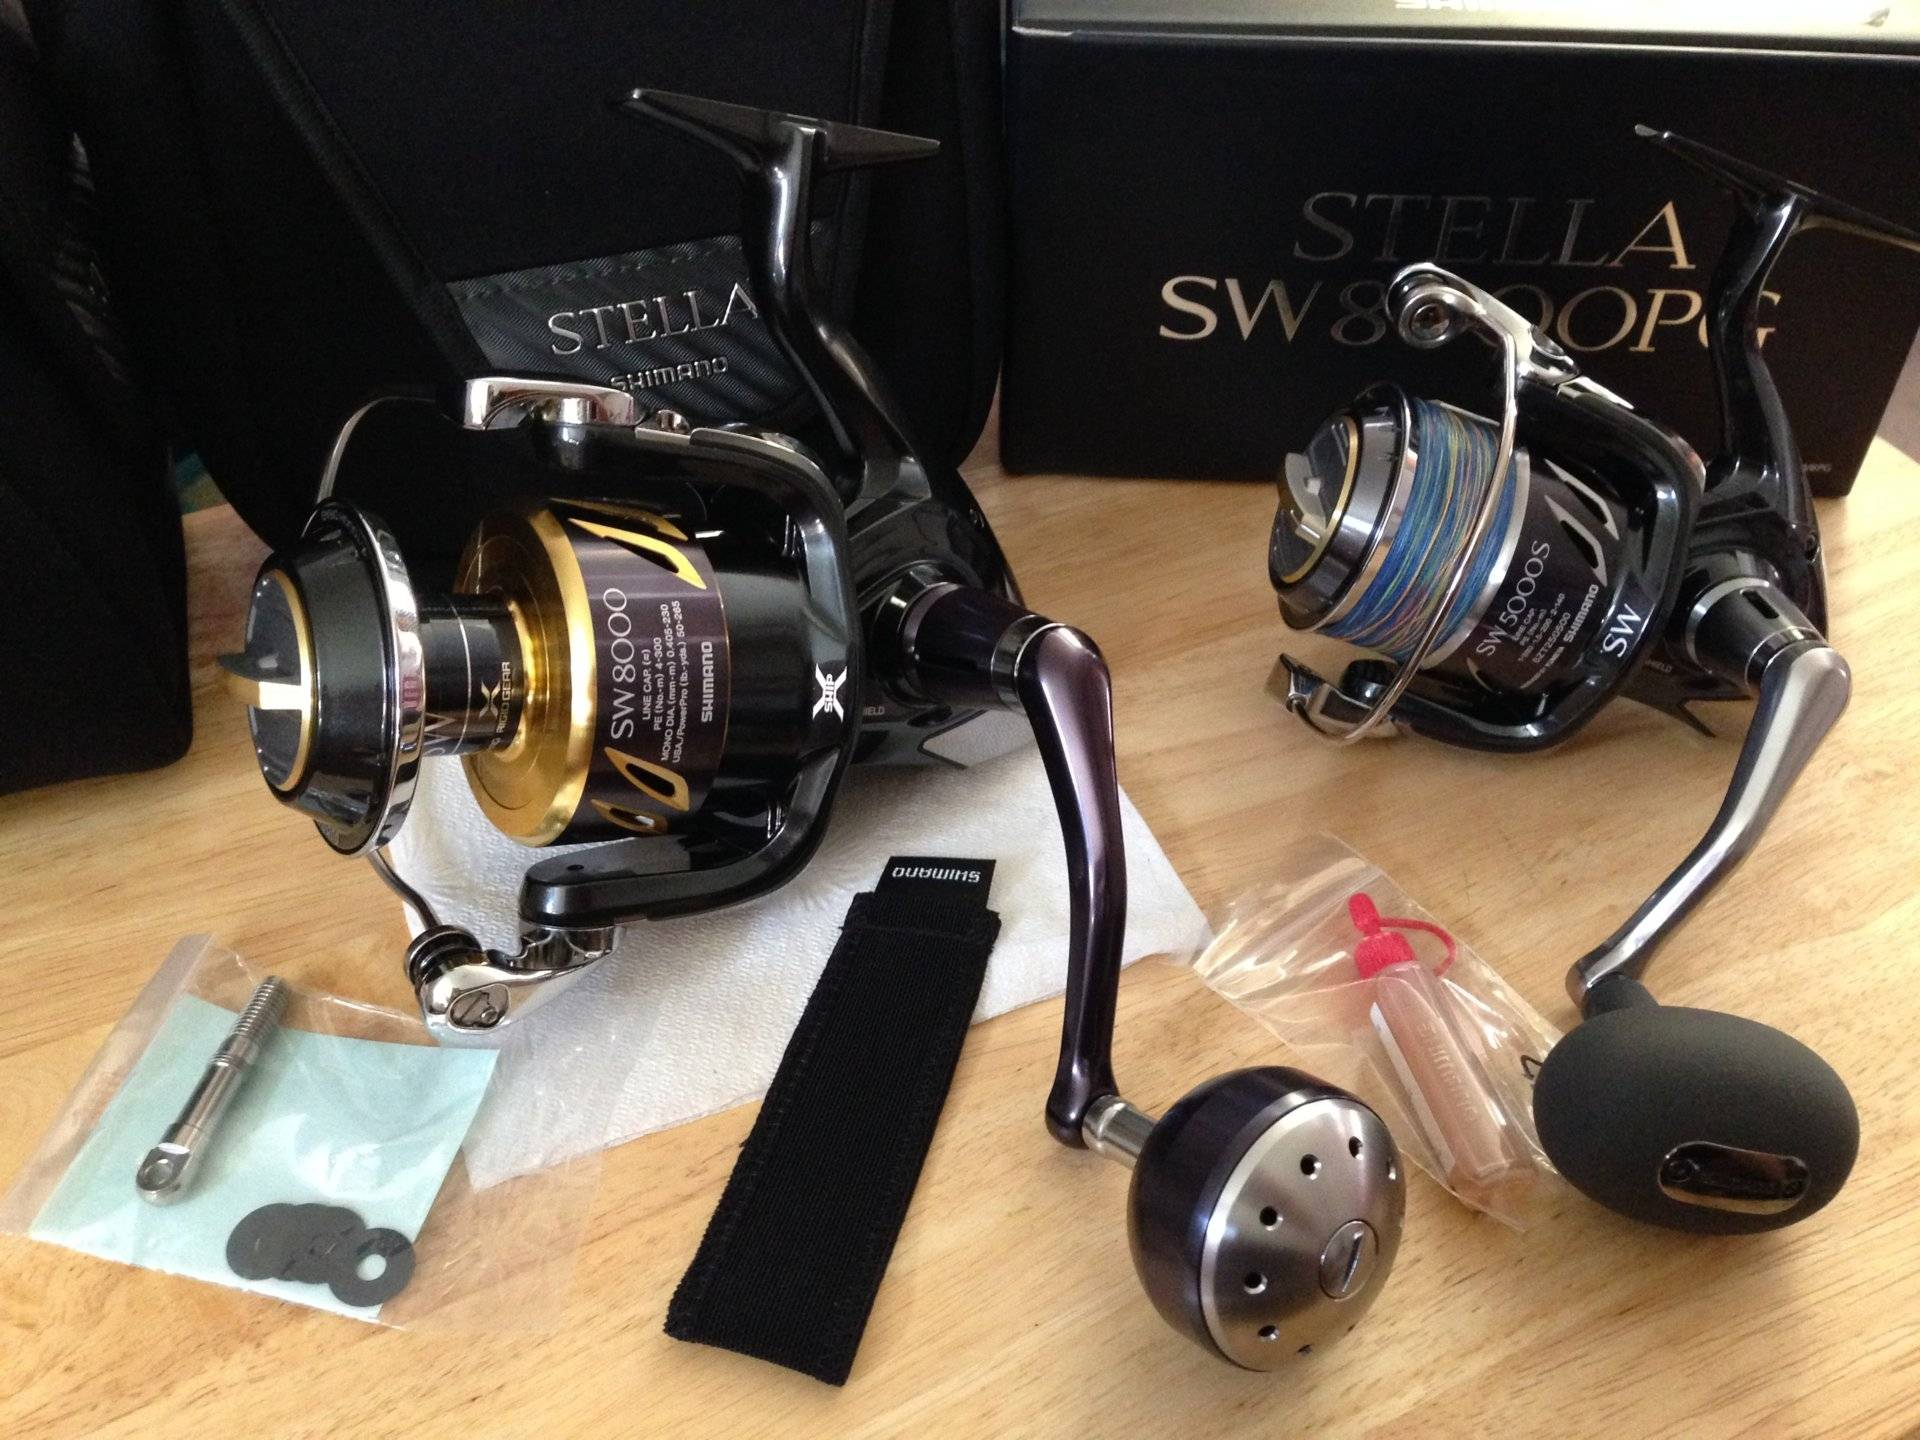 Shimano Stella 8000PG SWB Brand New | Bloodydecks